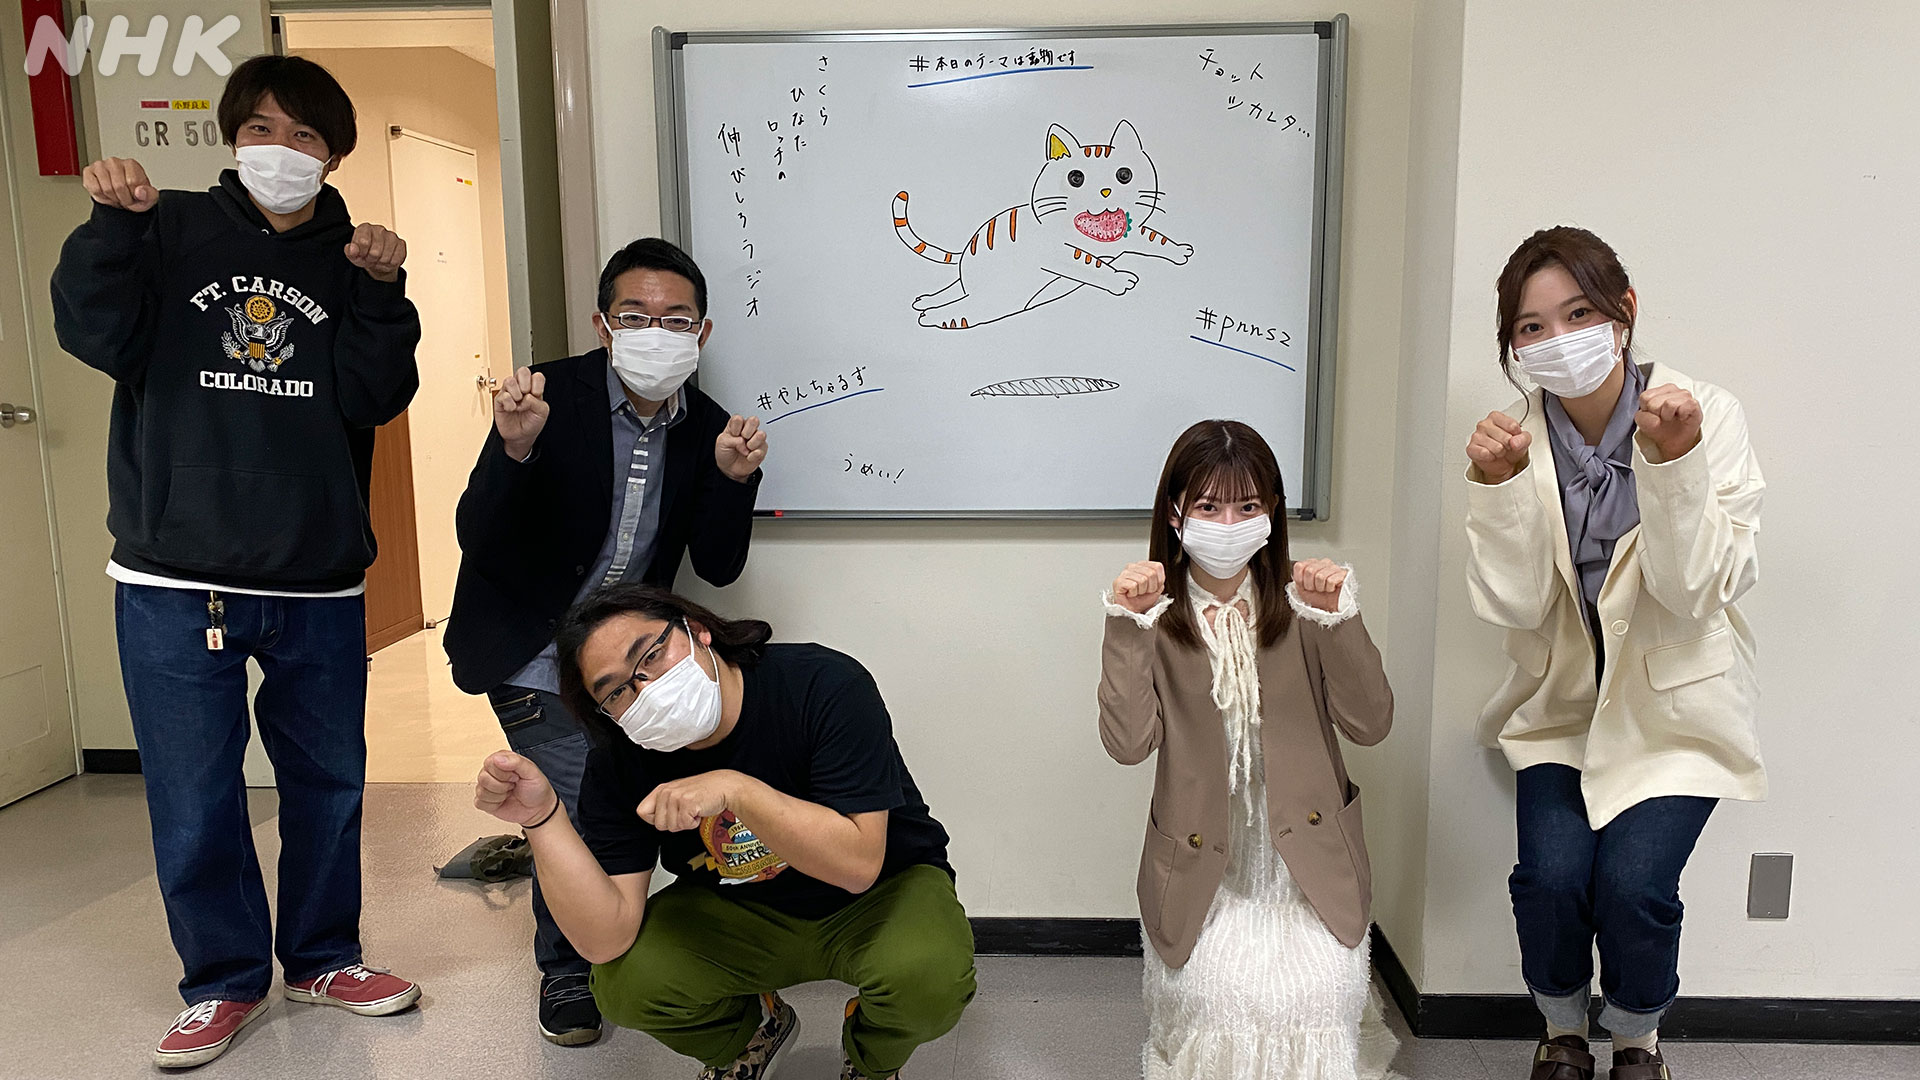 NHKラジオが猫だらけに・・・日向坂46東村芽依×富田鈴花出演「さくらひなたロッチの伸びしろラジオ」出演直前オフショット公開